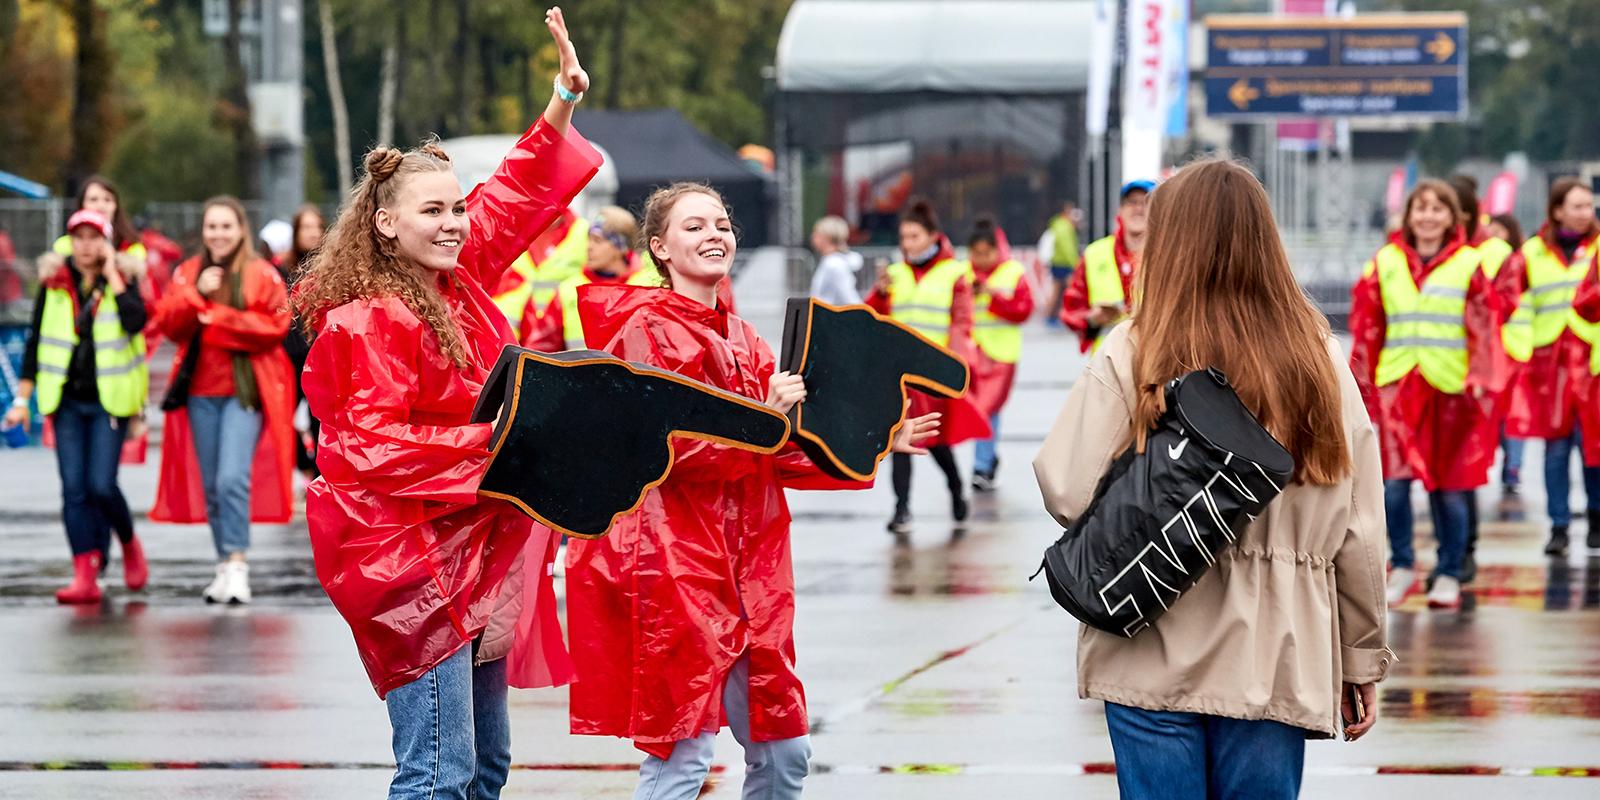 2 августа стартует марафон благодарности «Спасибо, волонтеры Москвы»